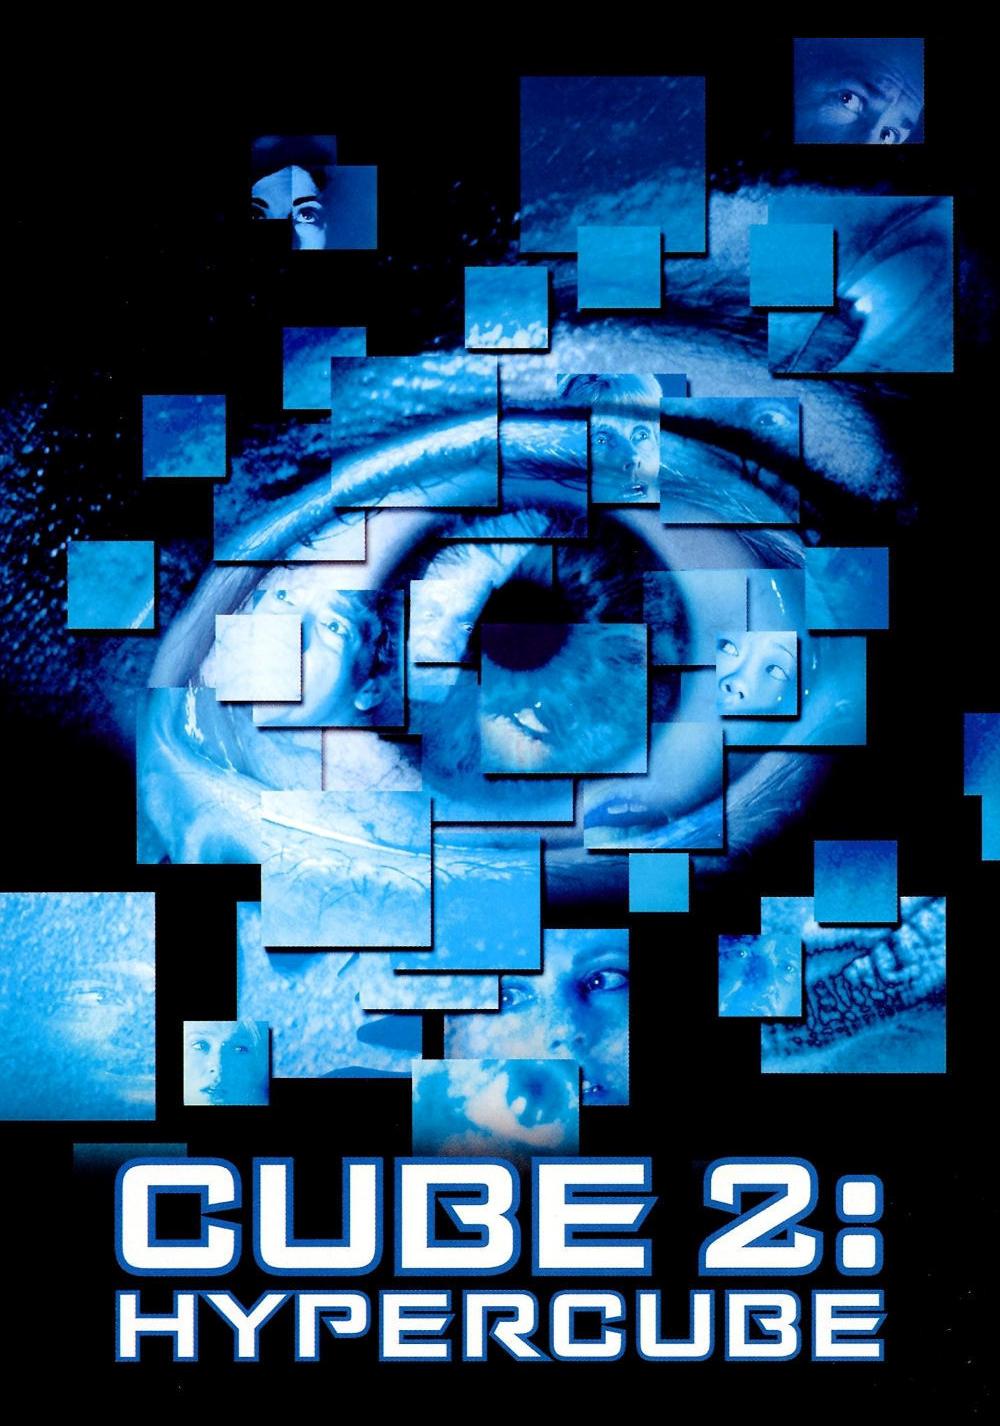 Cube 2: Hypercube | Movie fanart | fanart.tv